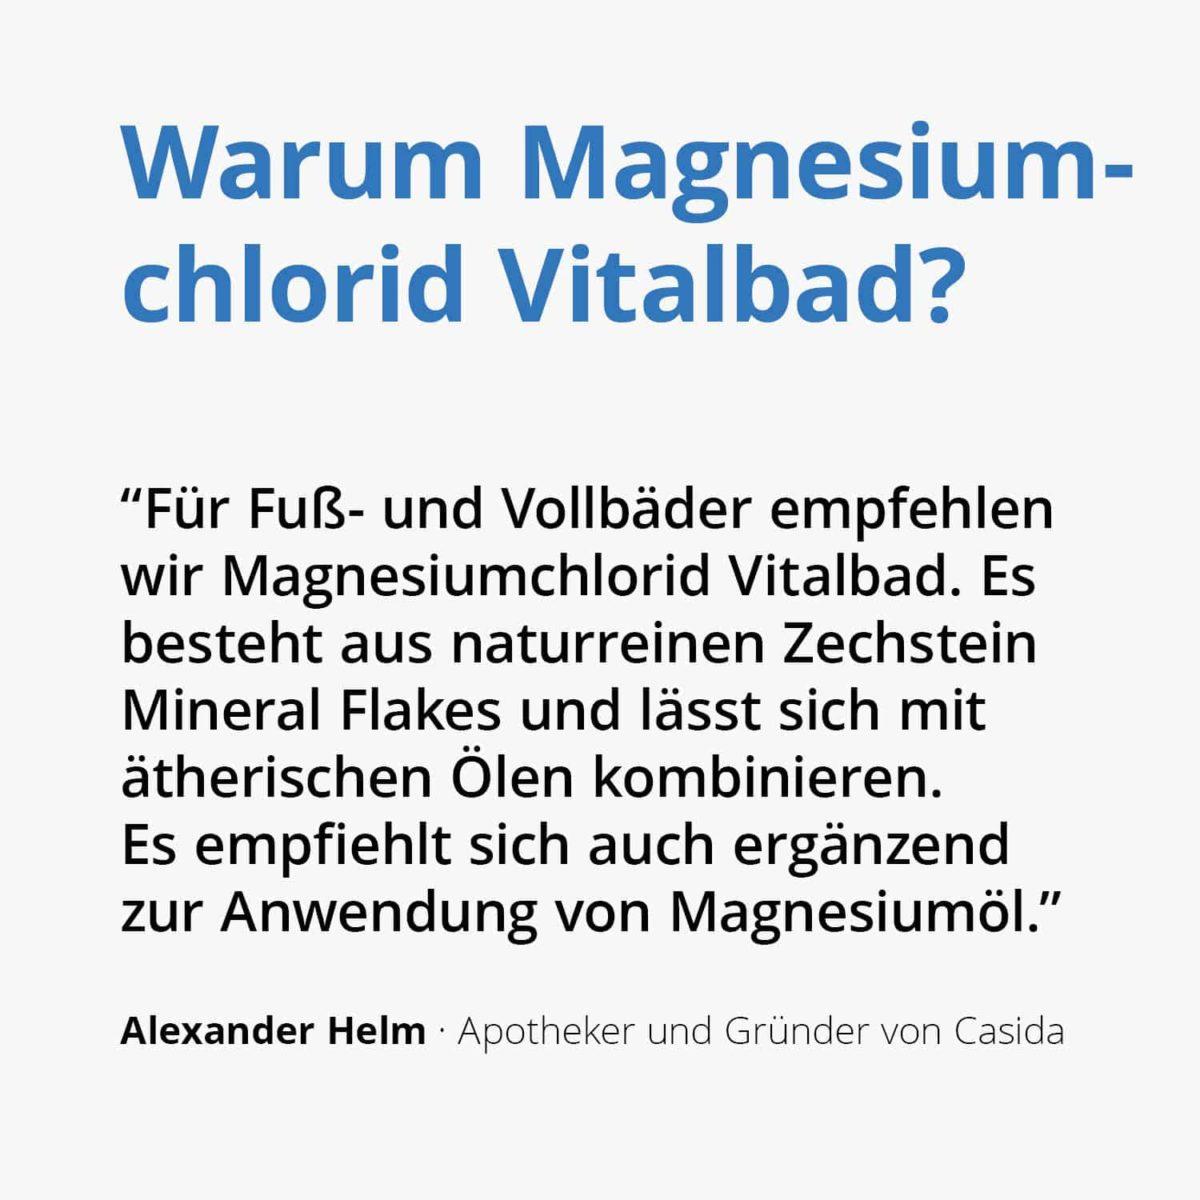 Casida Magnesiumchlorid Vitalbad Zechstein 1,0 kg 11615851 PZN Apotheke Muskelkater Sole Vollbad Fußbad Salz2